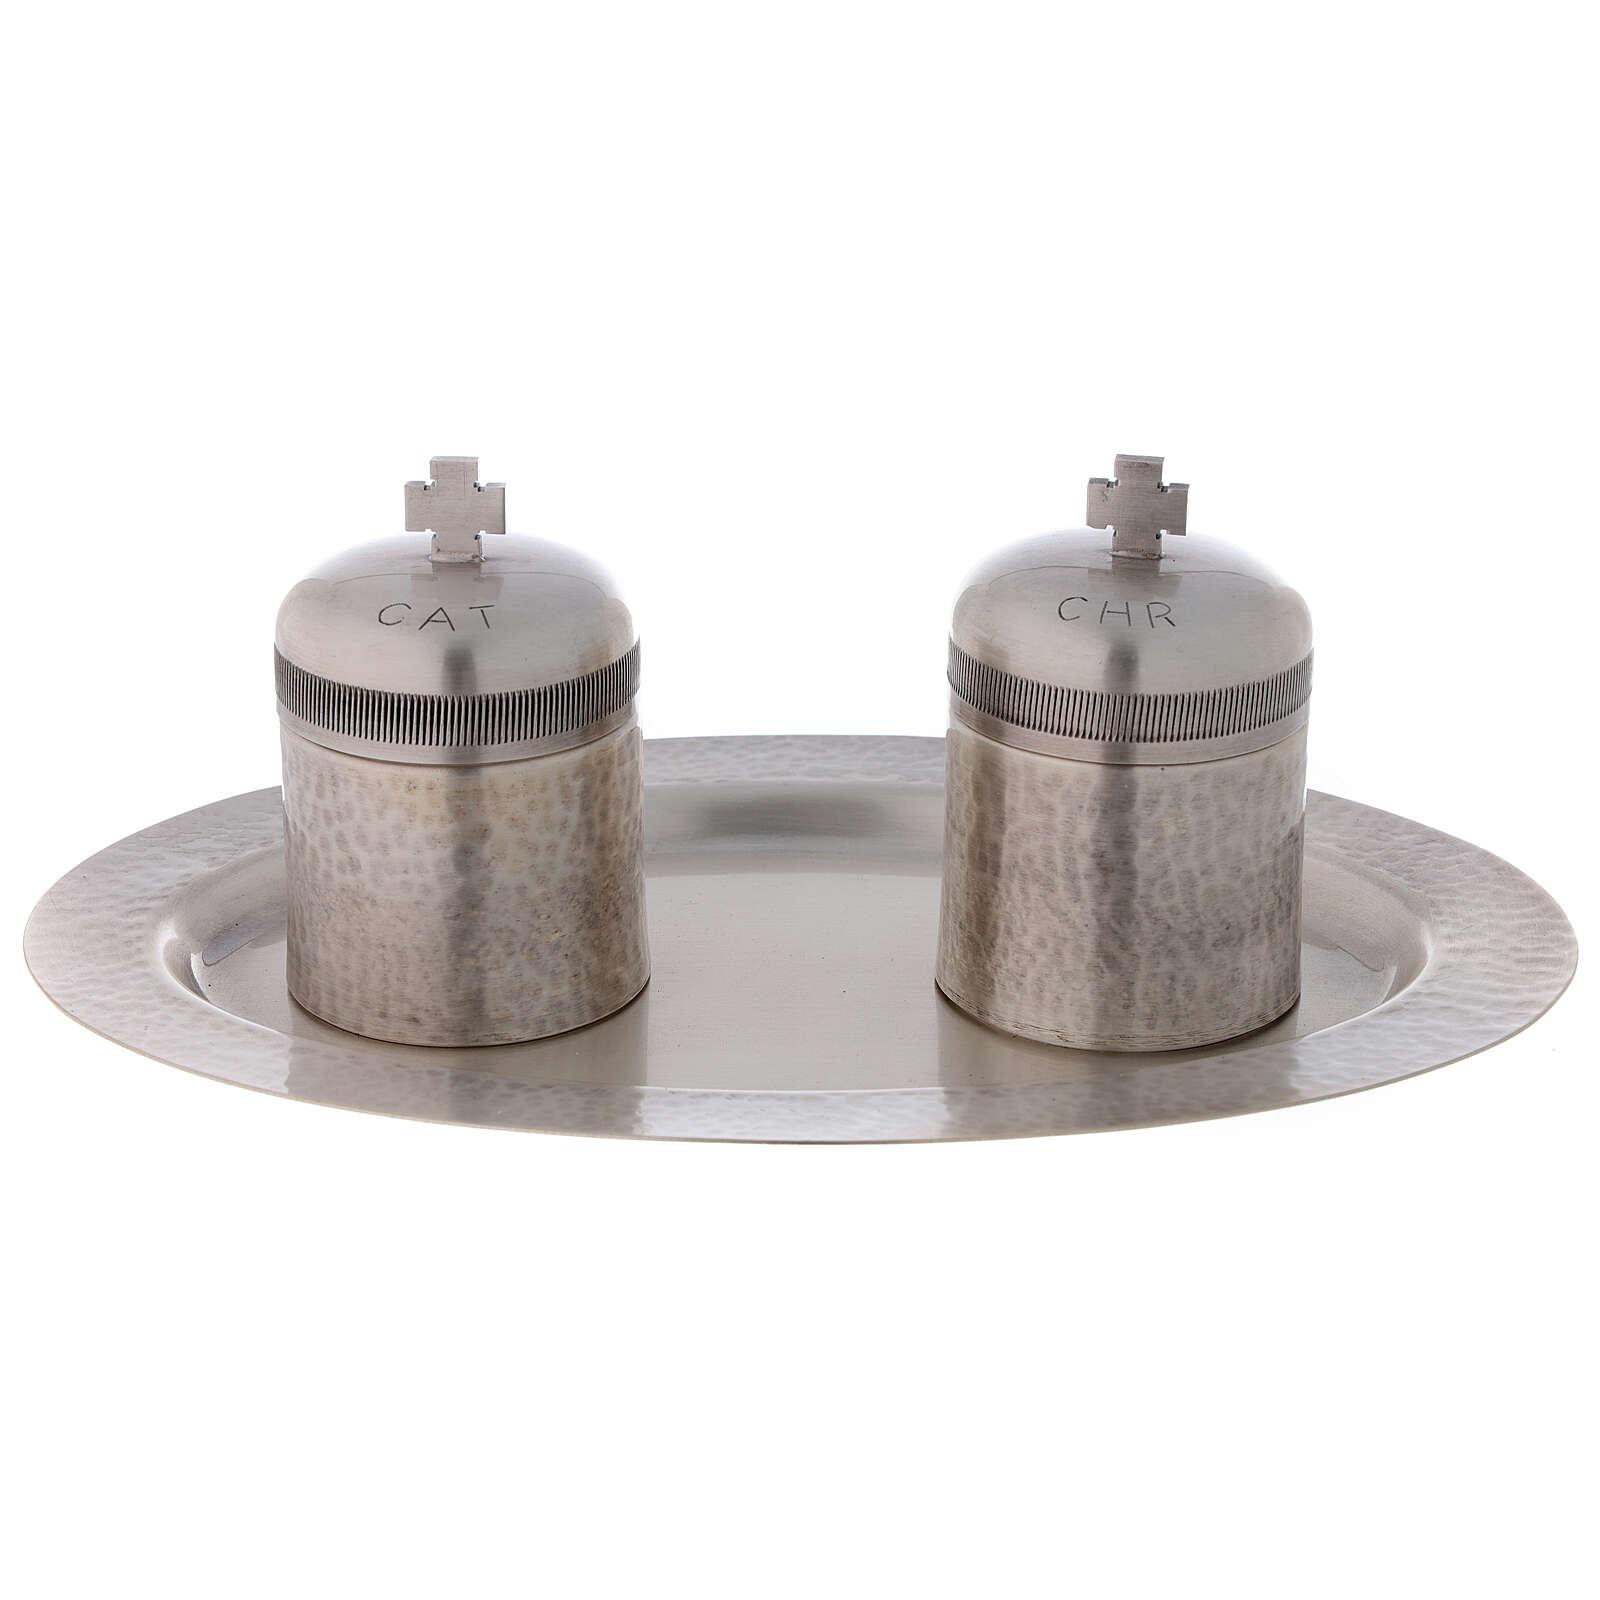 Conjunto dois vasos óleos santos latão prateado 50 ml 3